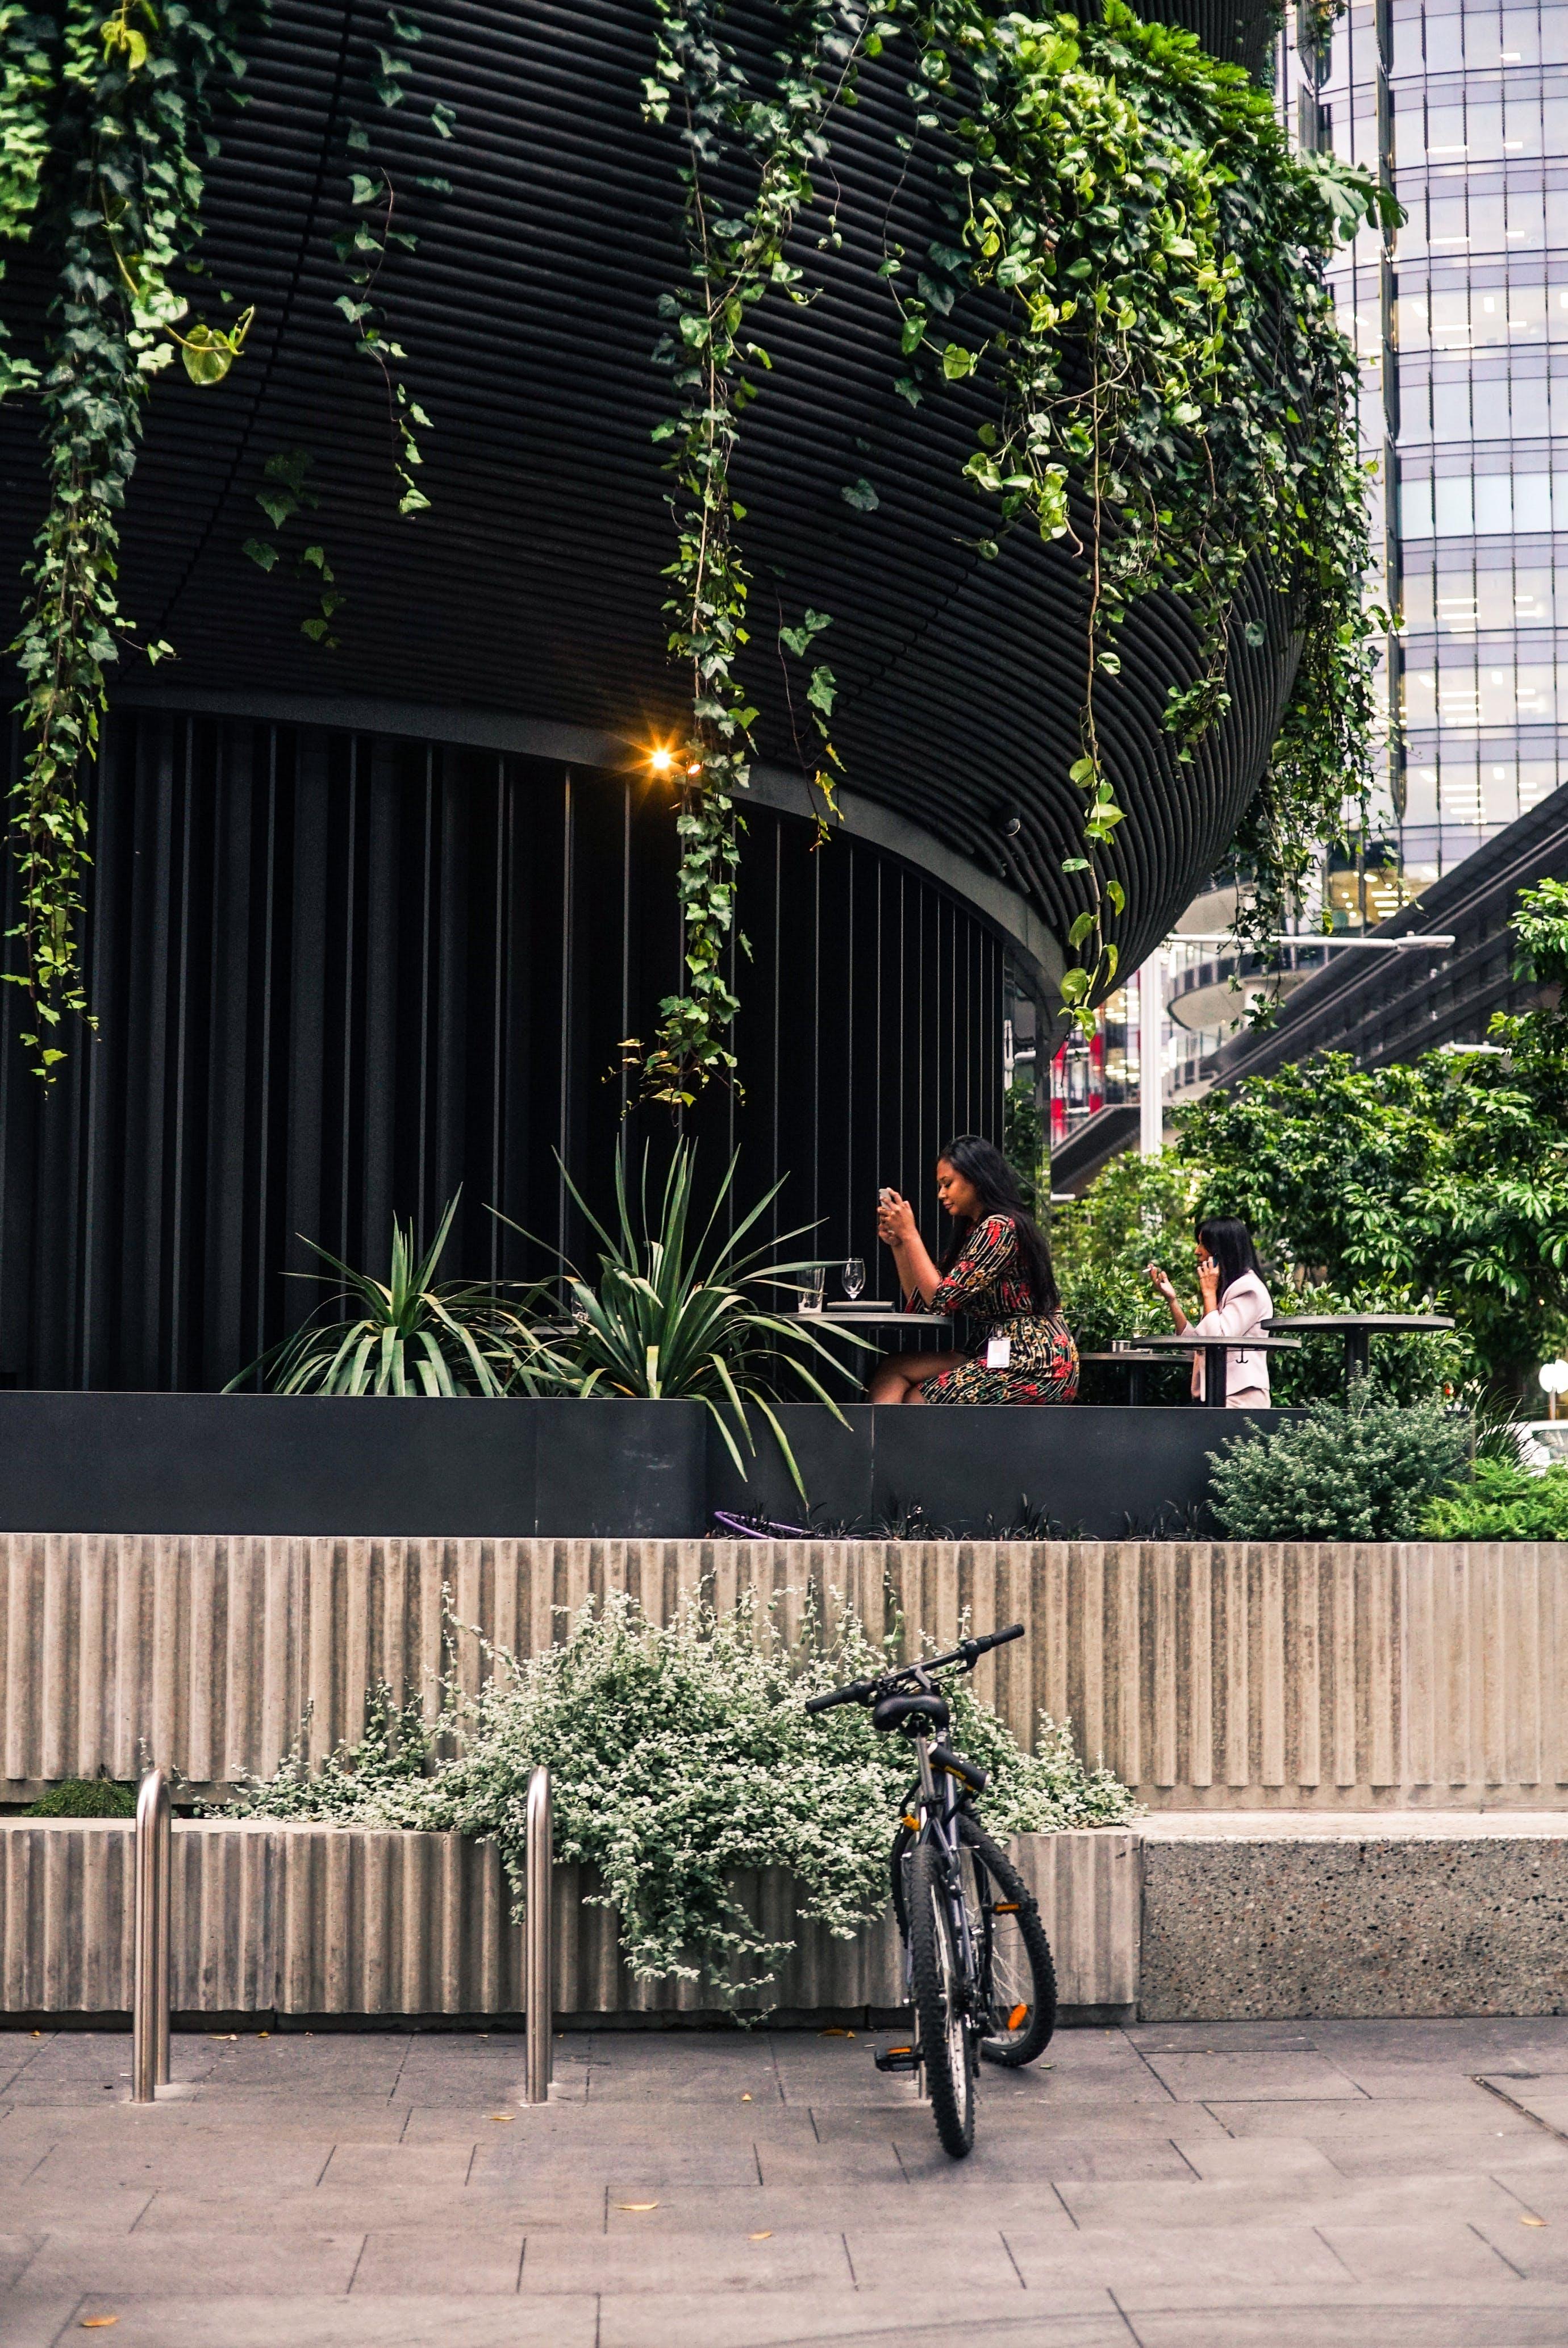 Woman Sitting on Chair Near Green Leafed Plant